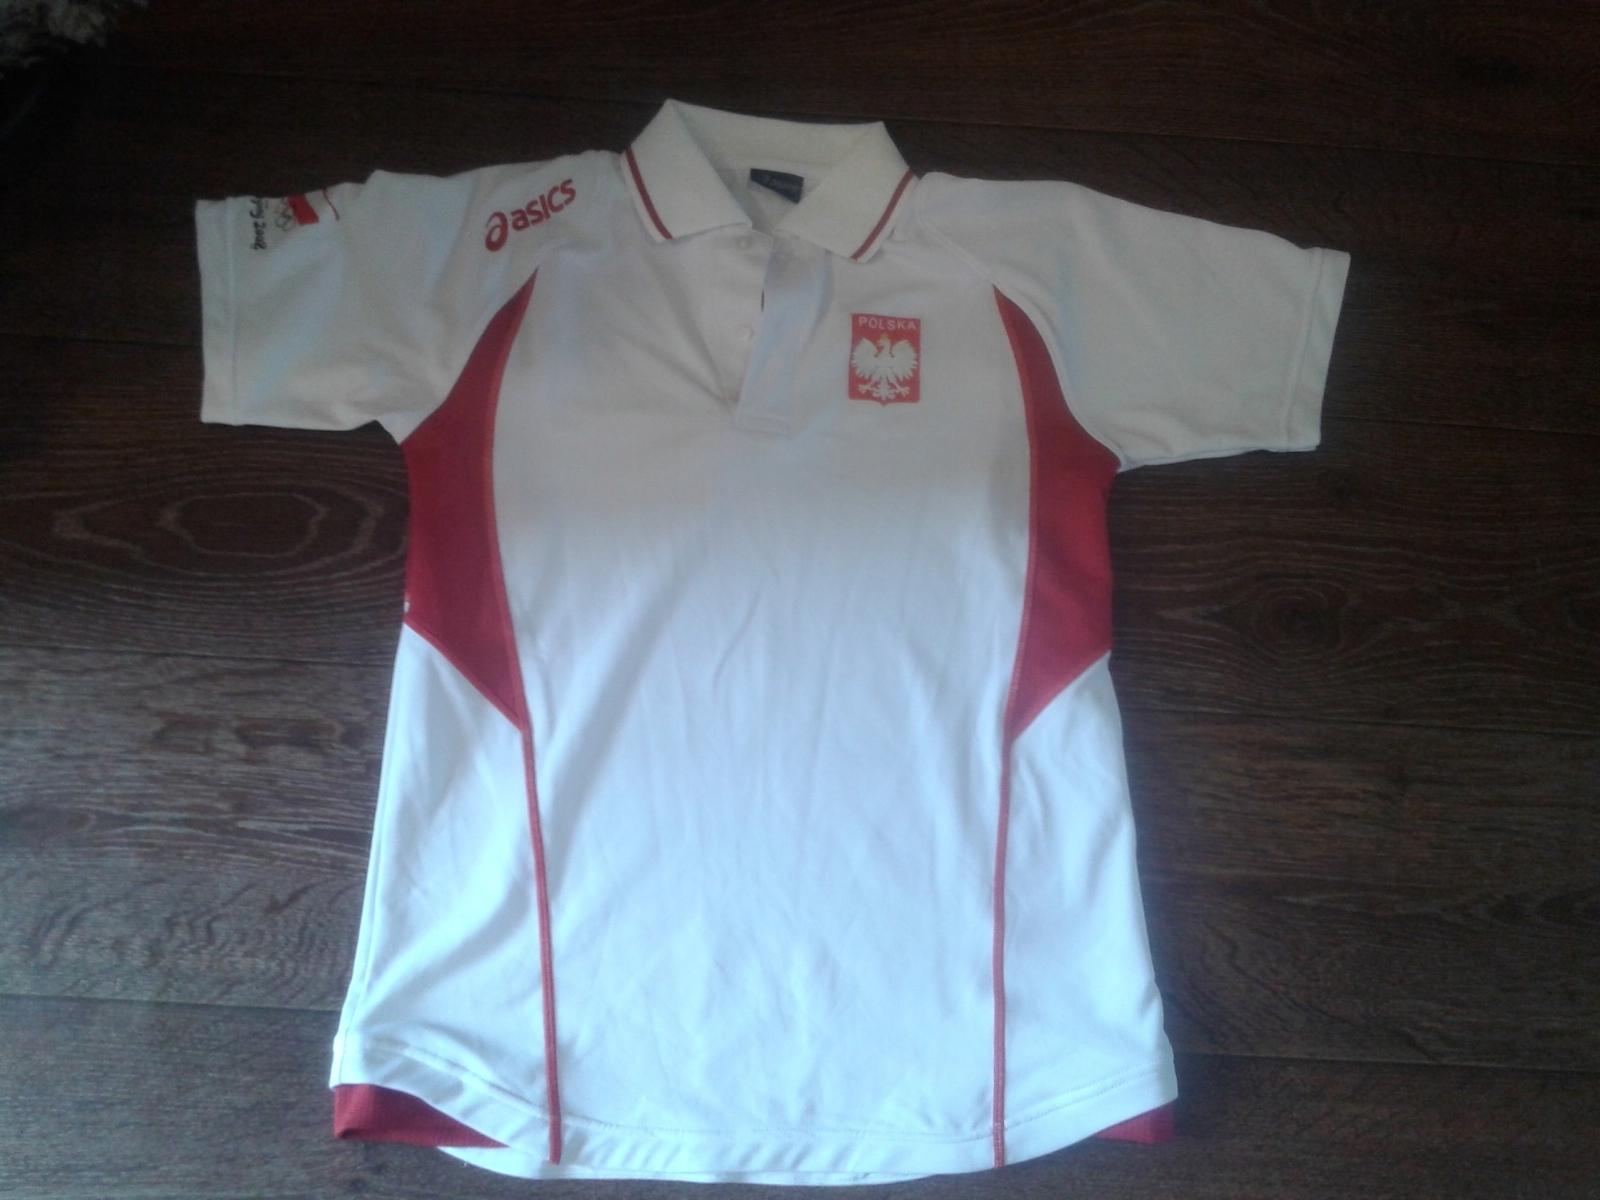 Koszulka POLSKA XXS asics siatkówka ( adidas )